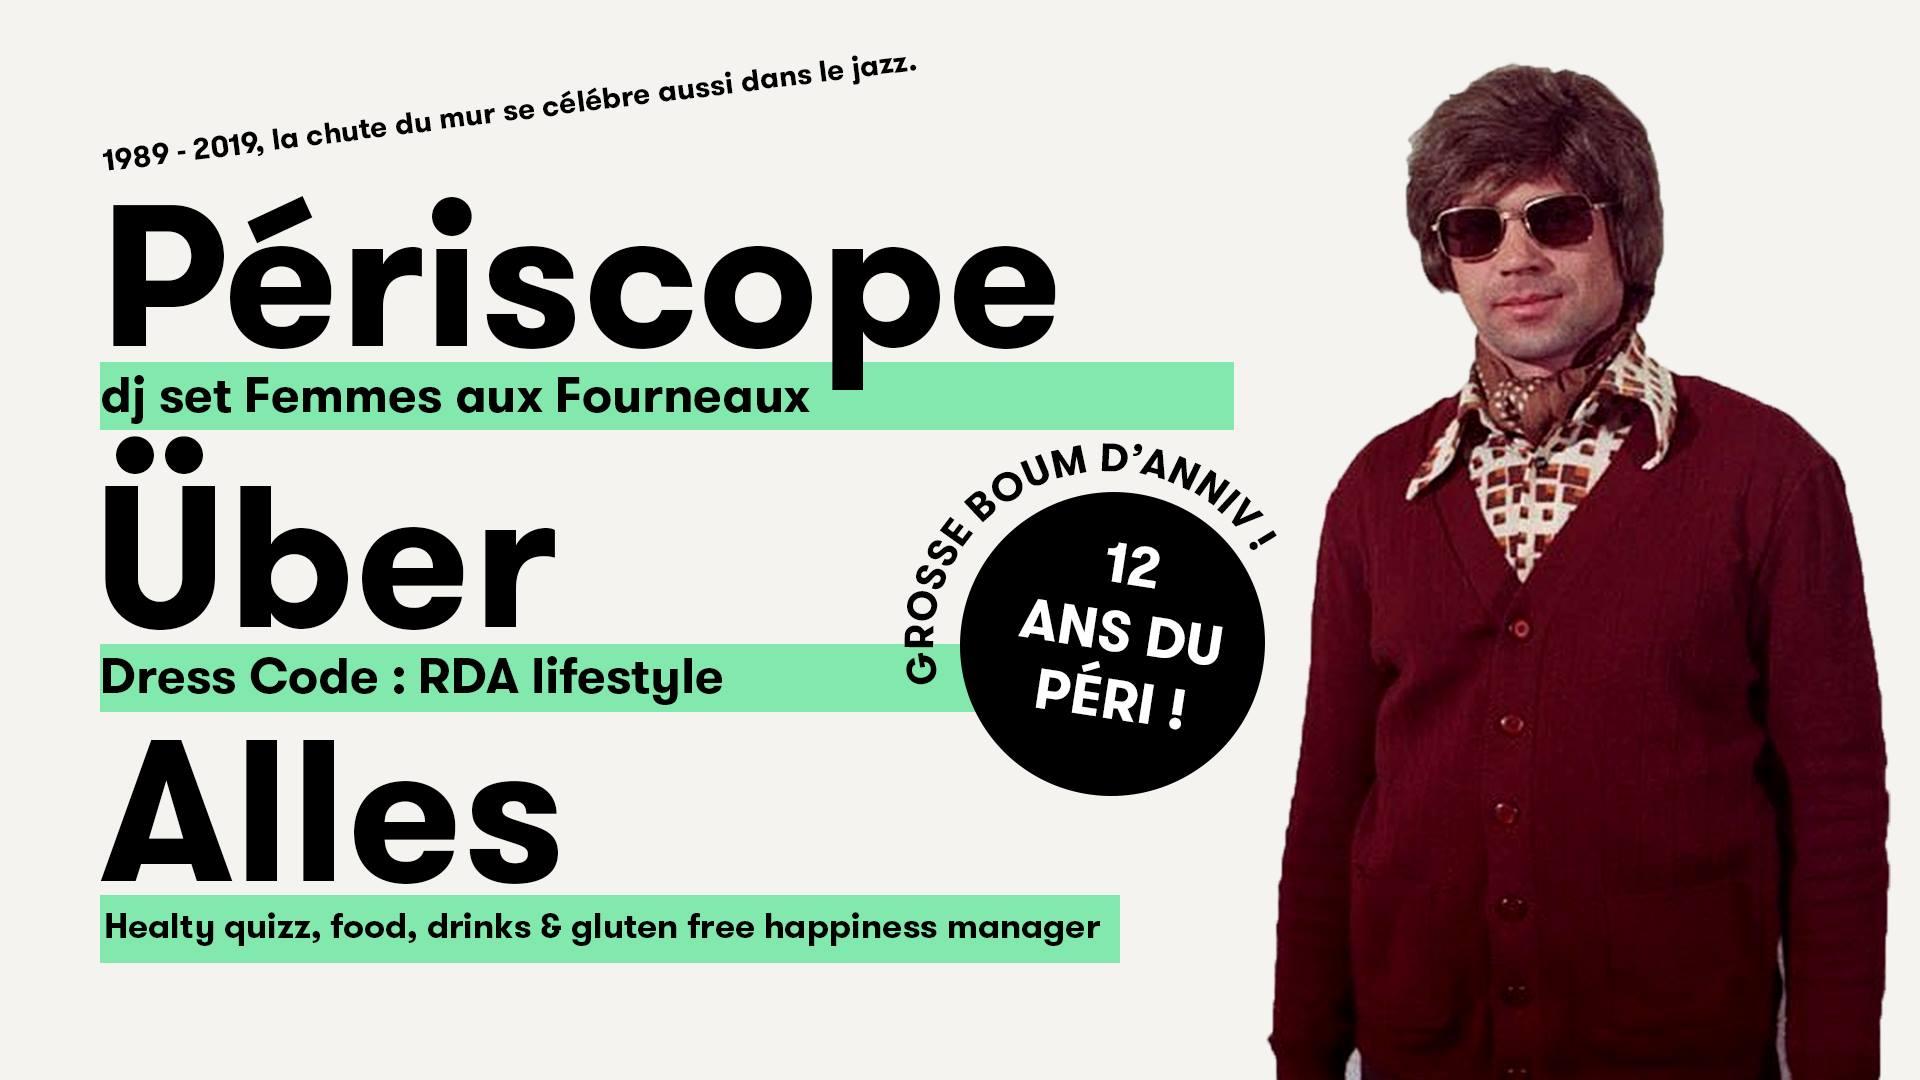 périscope 12 ans